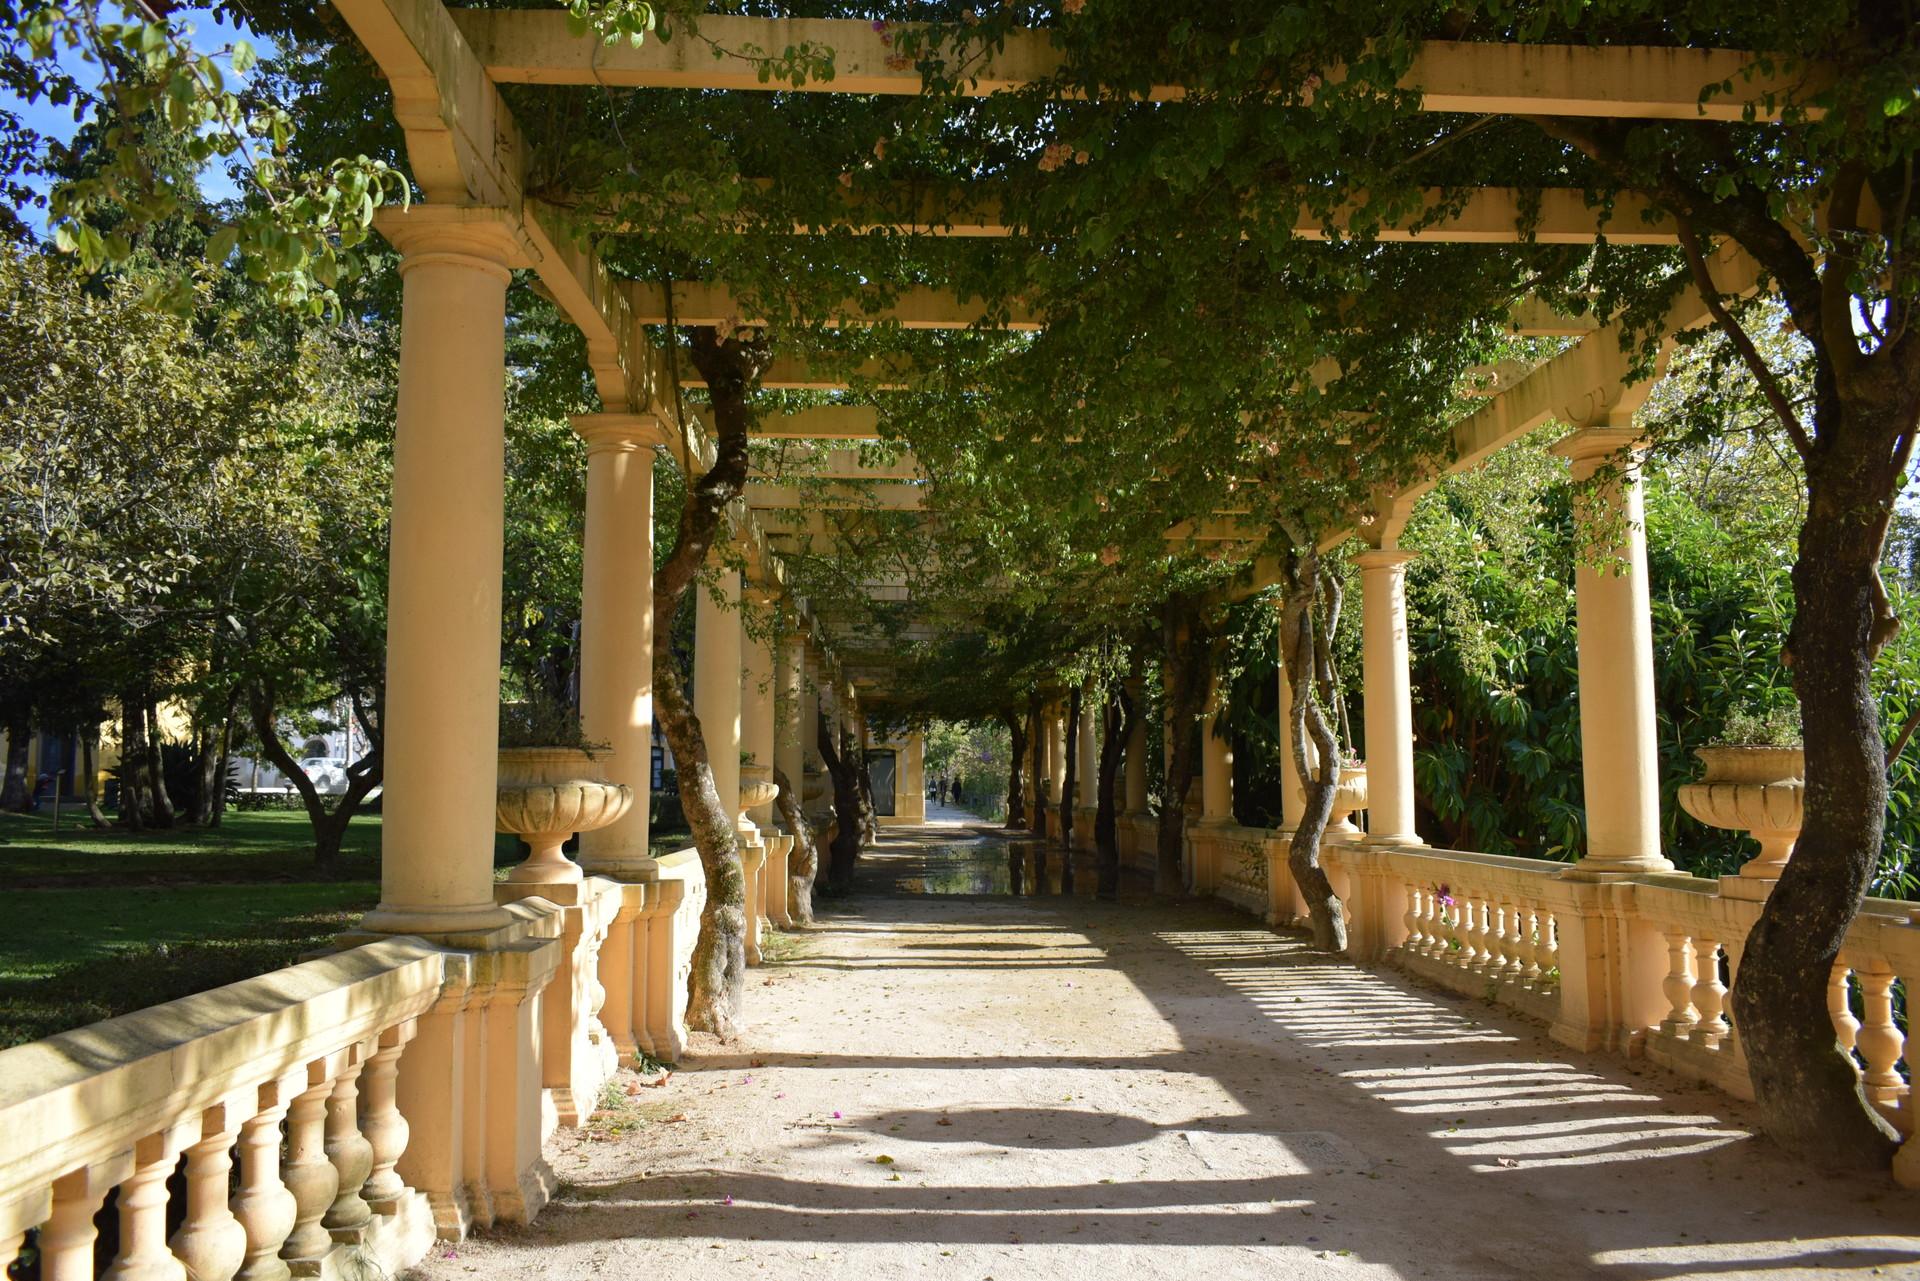 Viaje a Aveiro: la Venecia de Portugal